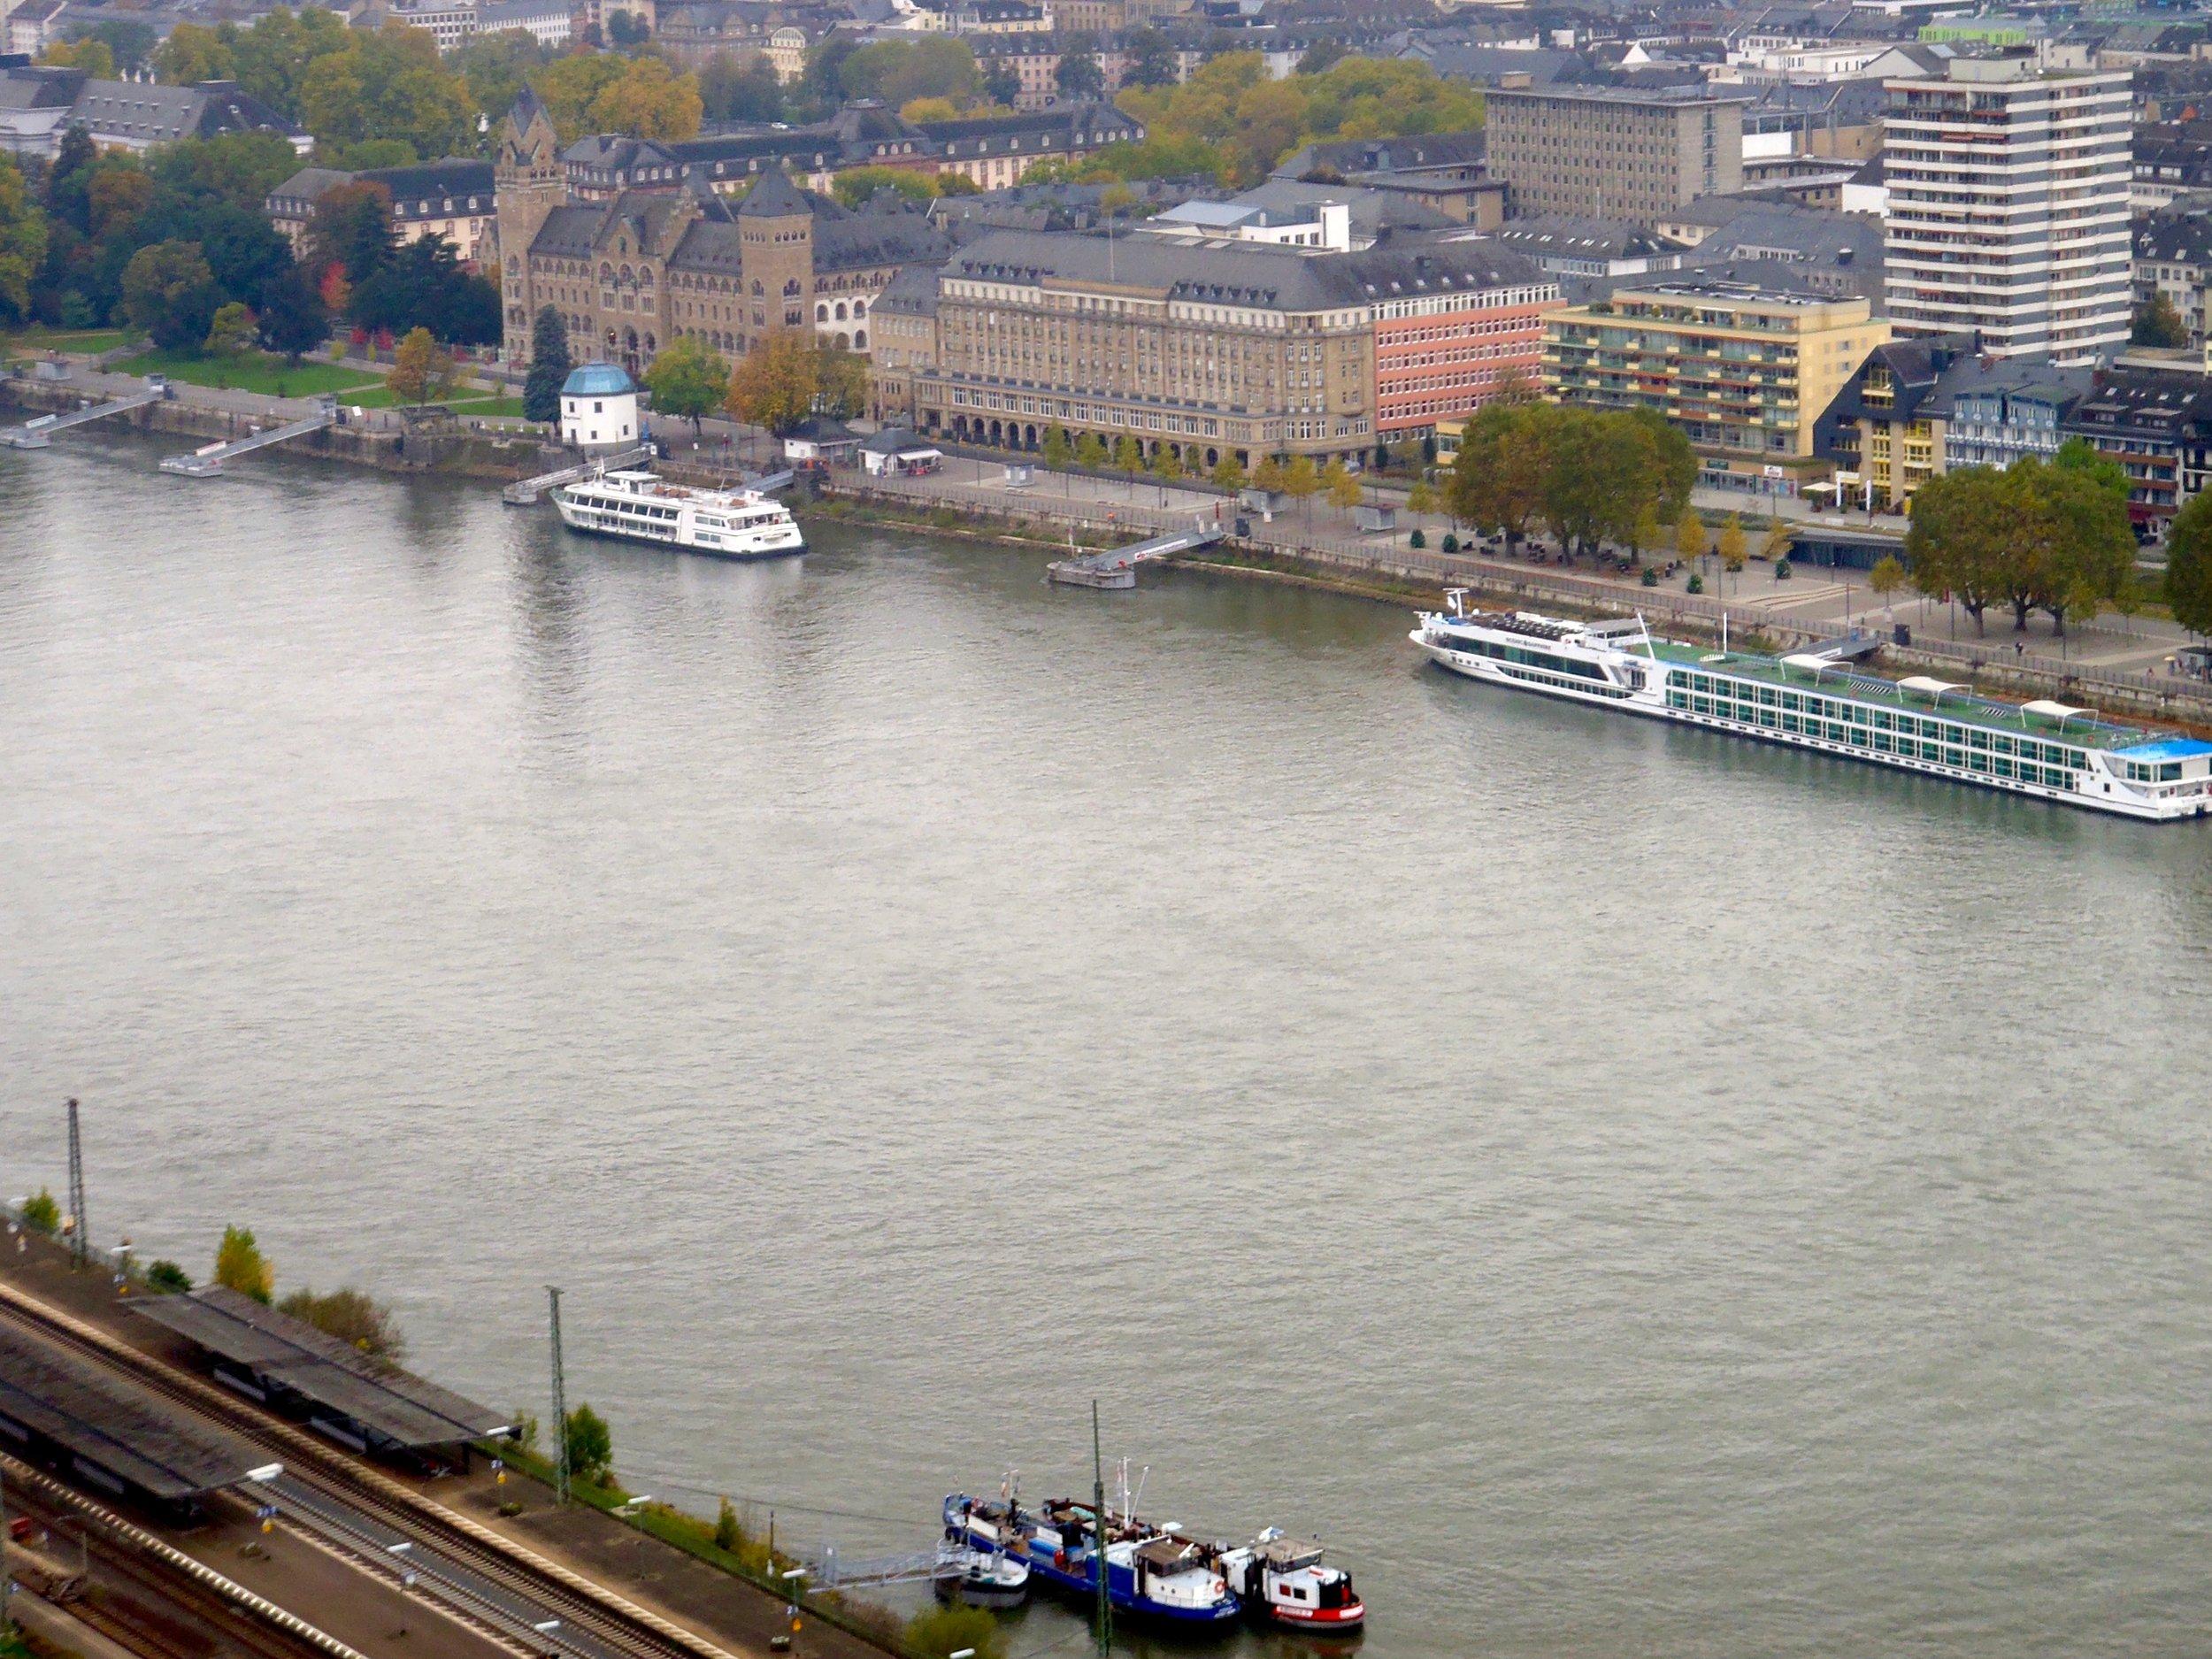 CRO 2014 Germany Web Photos - 31 of 52.jpg